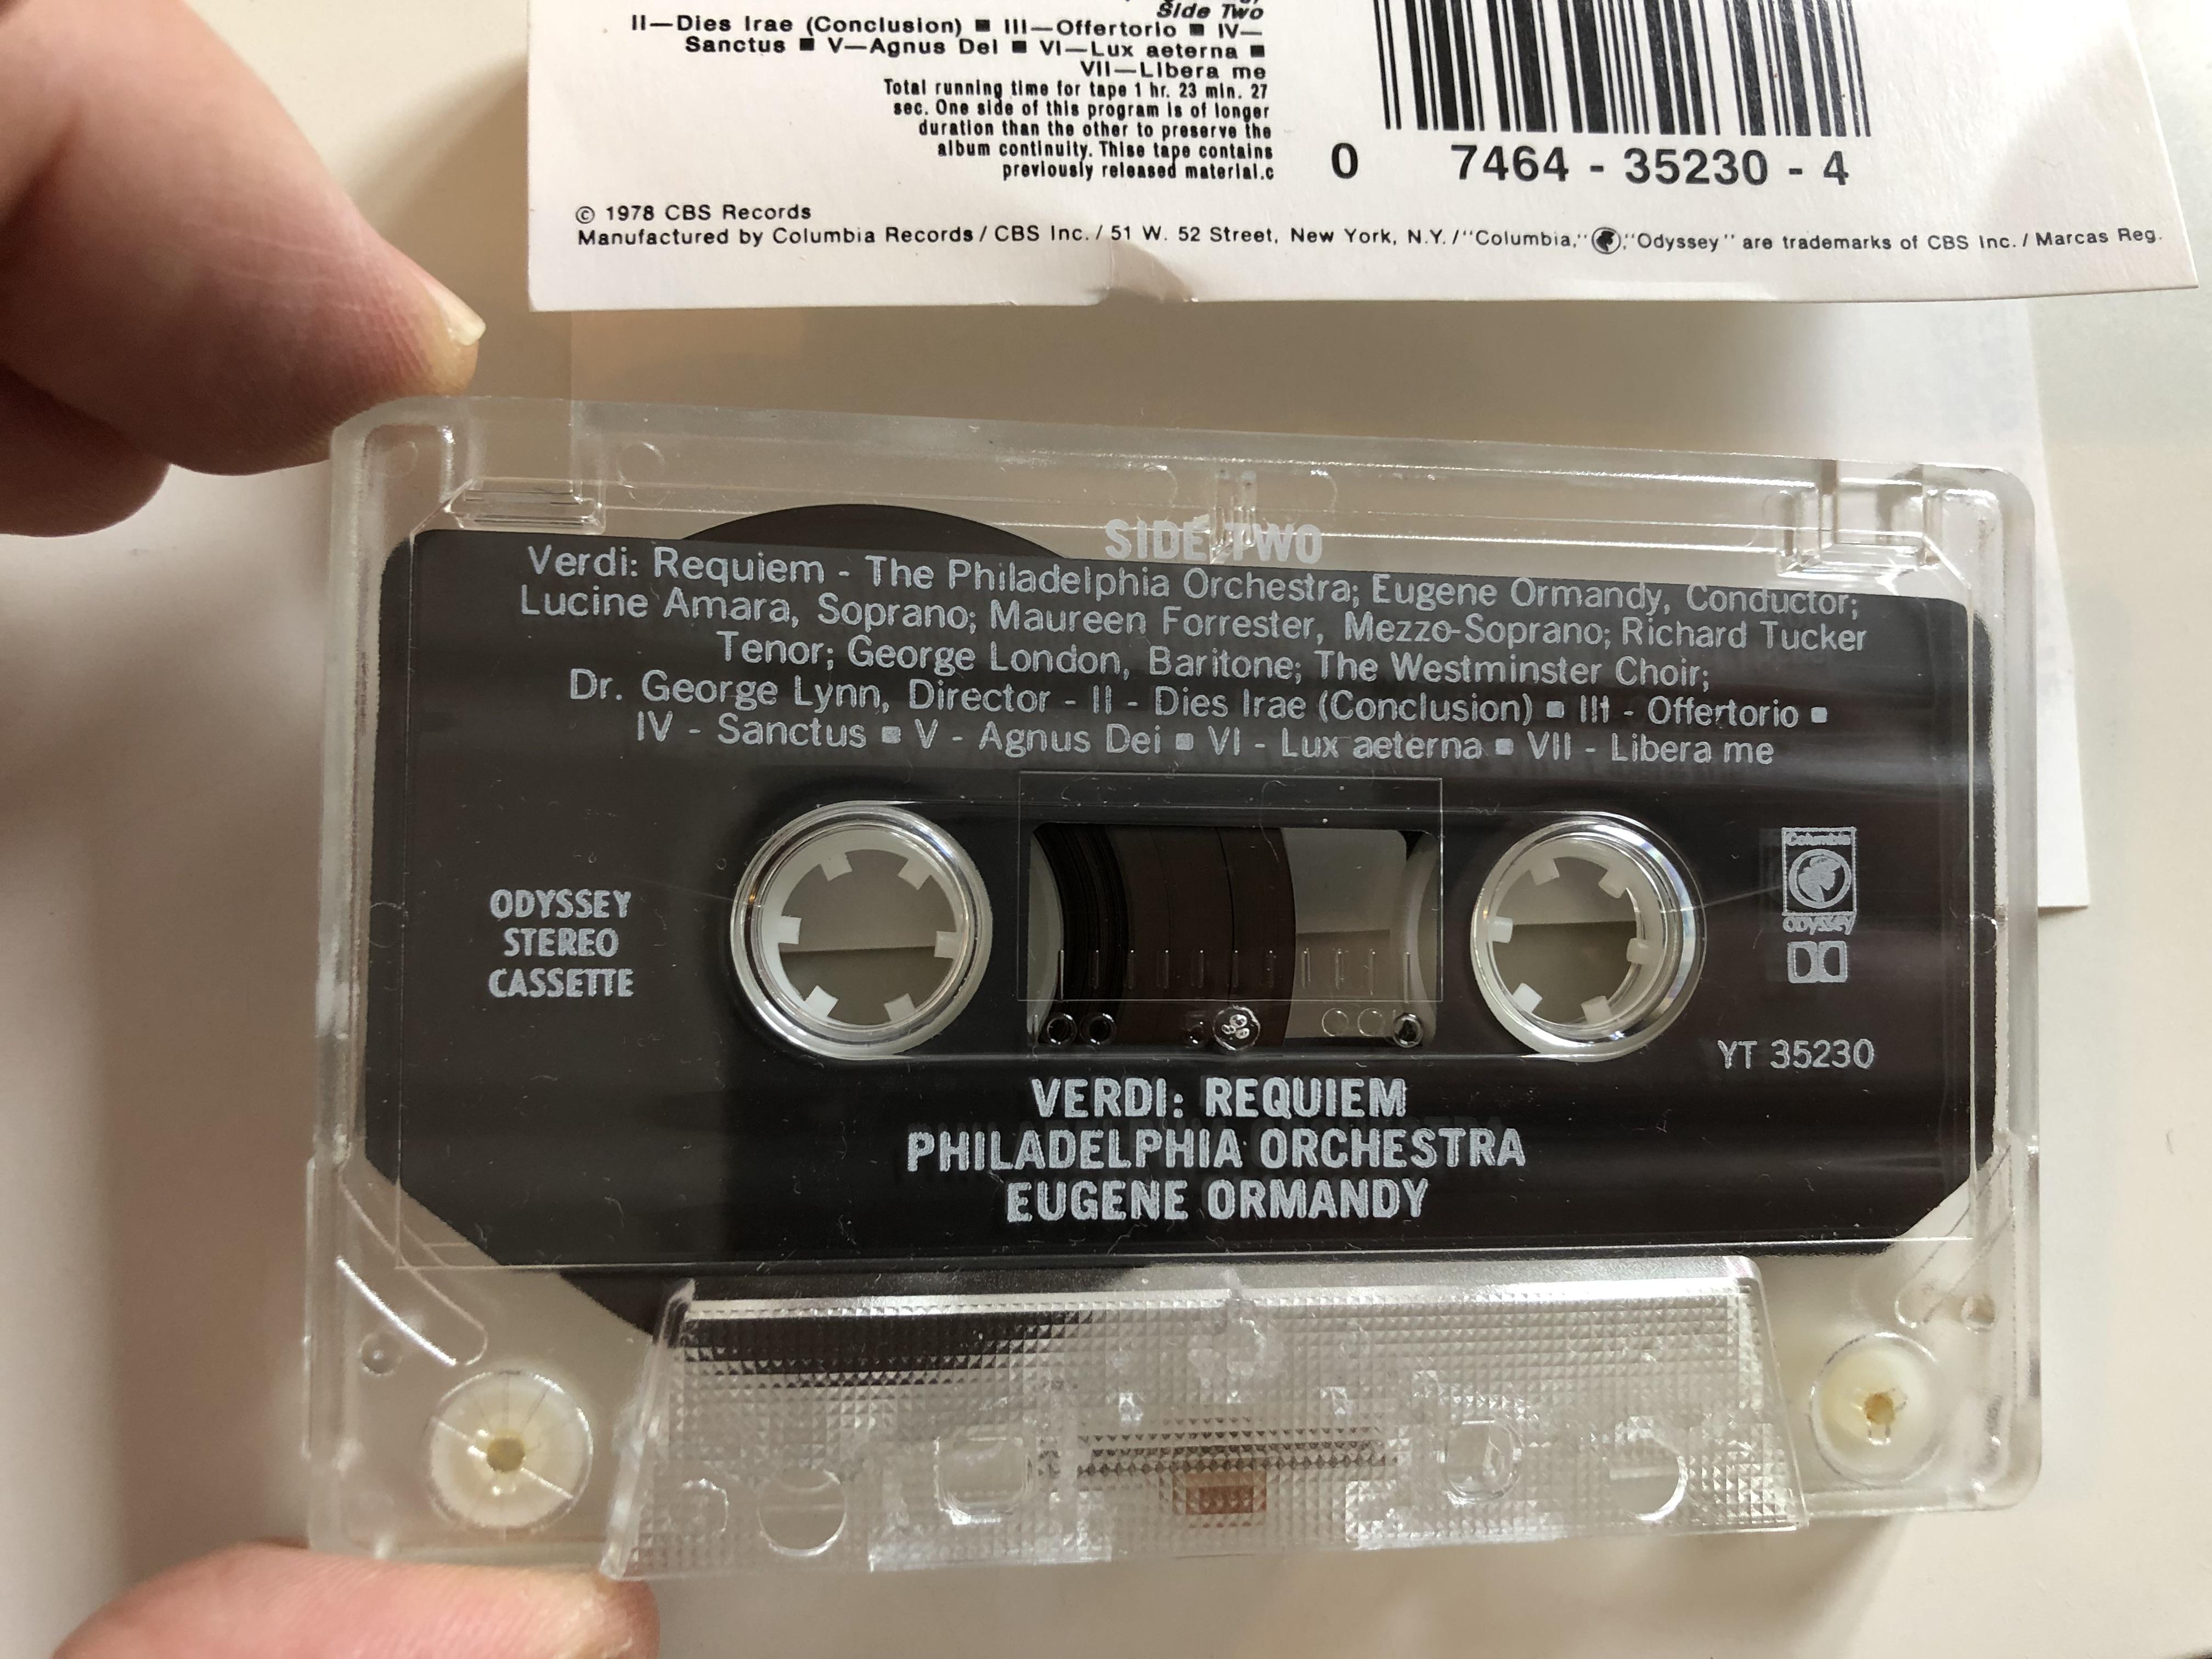 verdi-requiem-the-philadelphia-orchestra-conducted-eugene-ormandy-the-westminster-choir-odyssey-cassette-stereo-yt-35230-3-.jpg